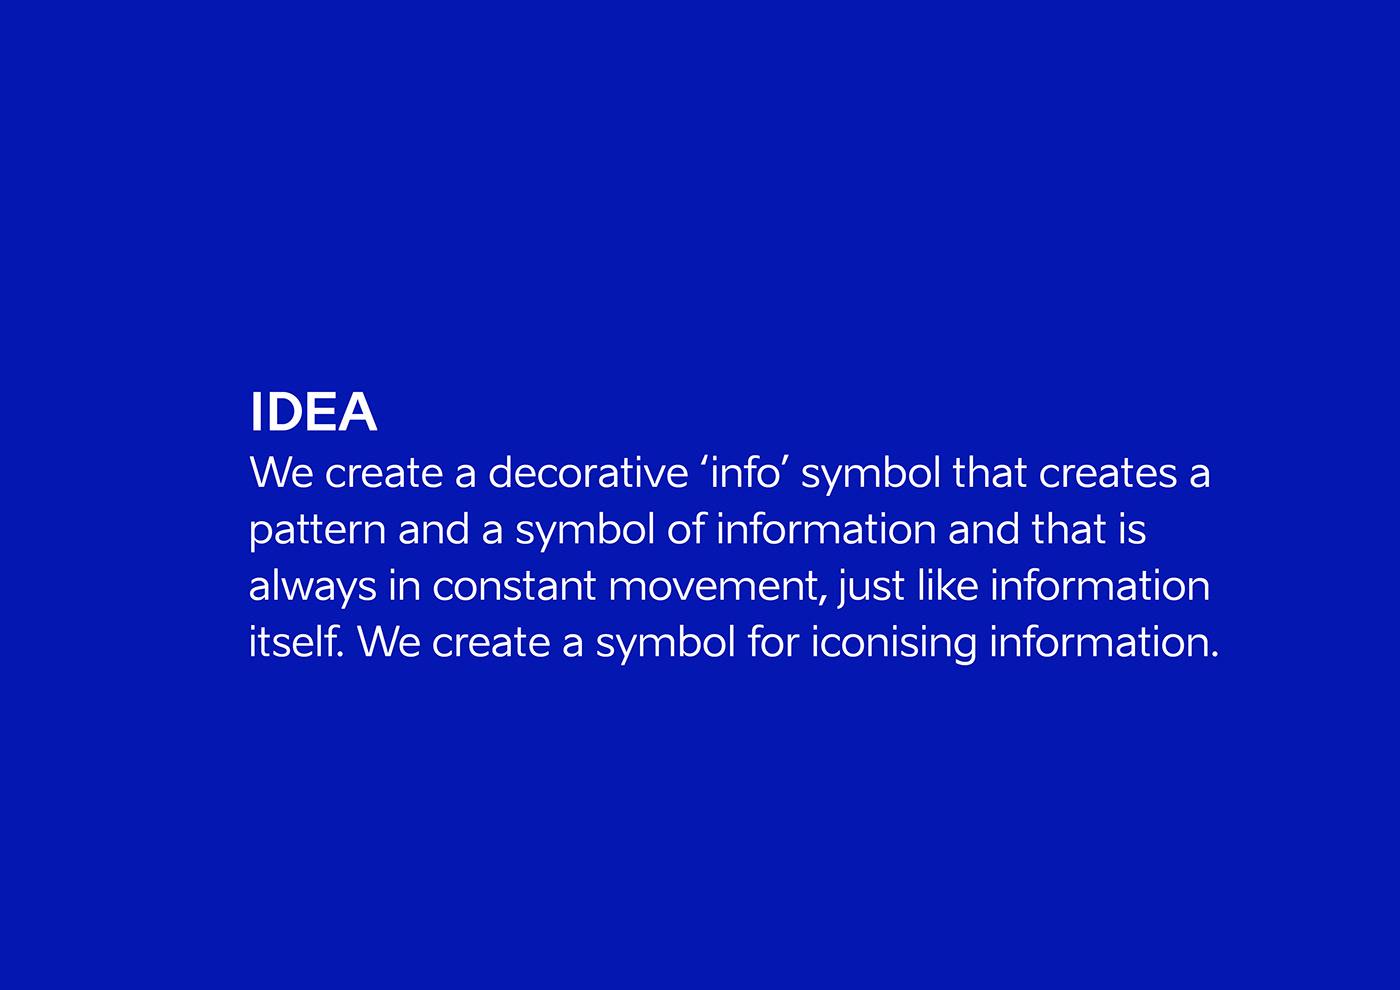 Event Event Design Event Branding pattern design  estonian design Electric Blue brand branding  Identity Design Corporate Identity